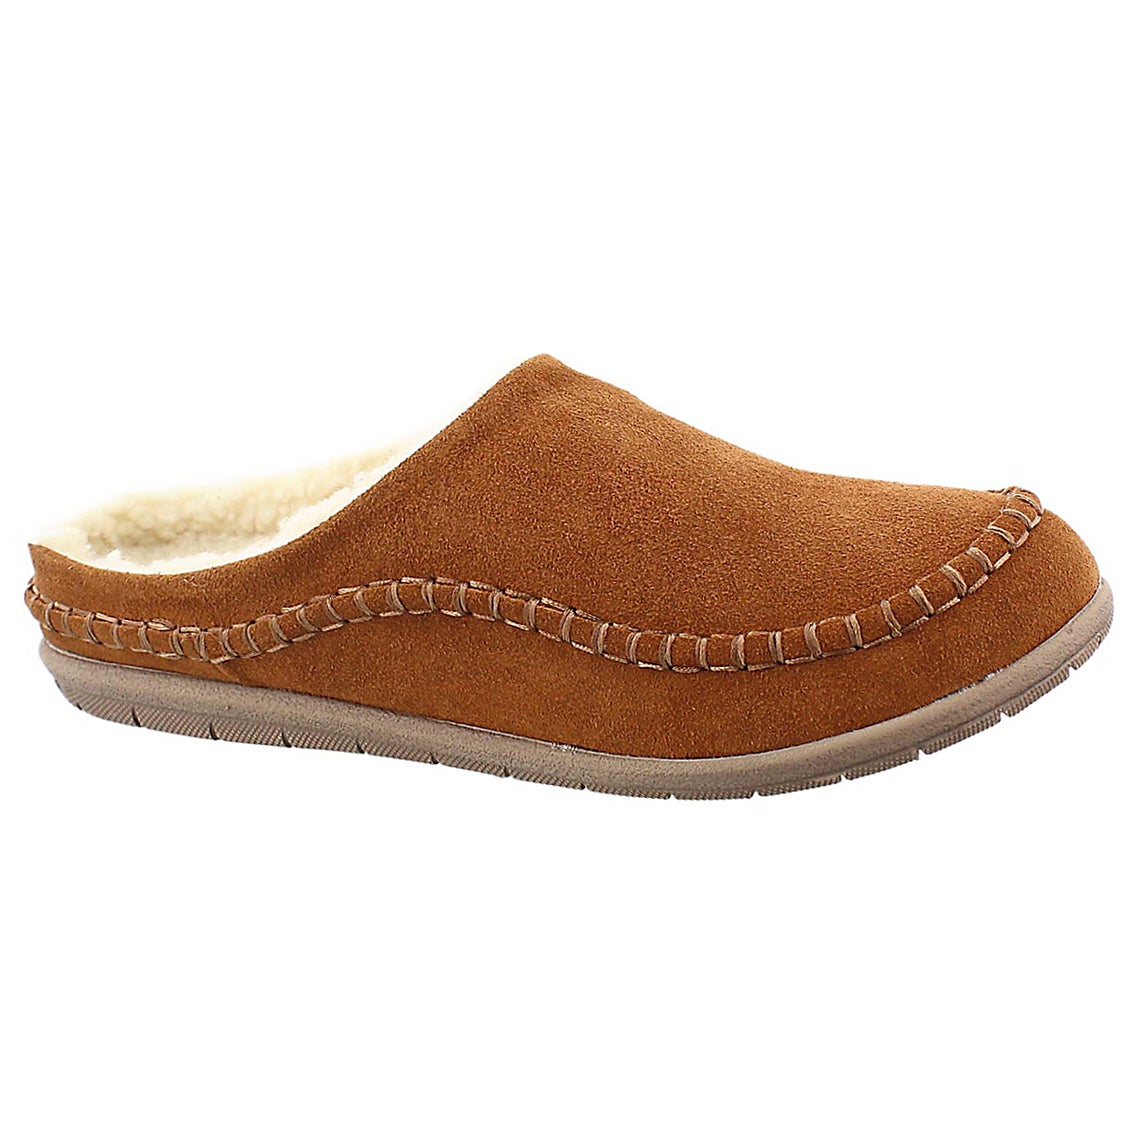 Mns Logan spice open back slipper